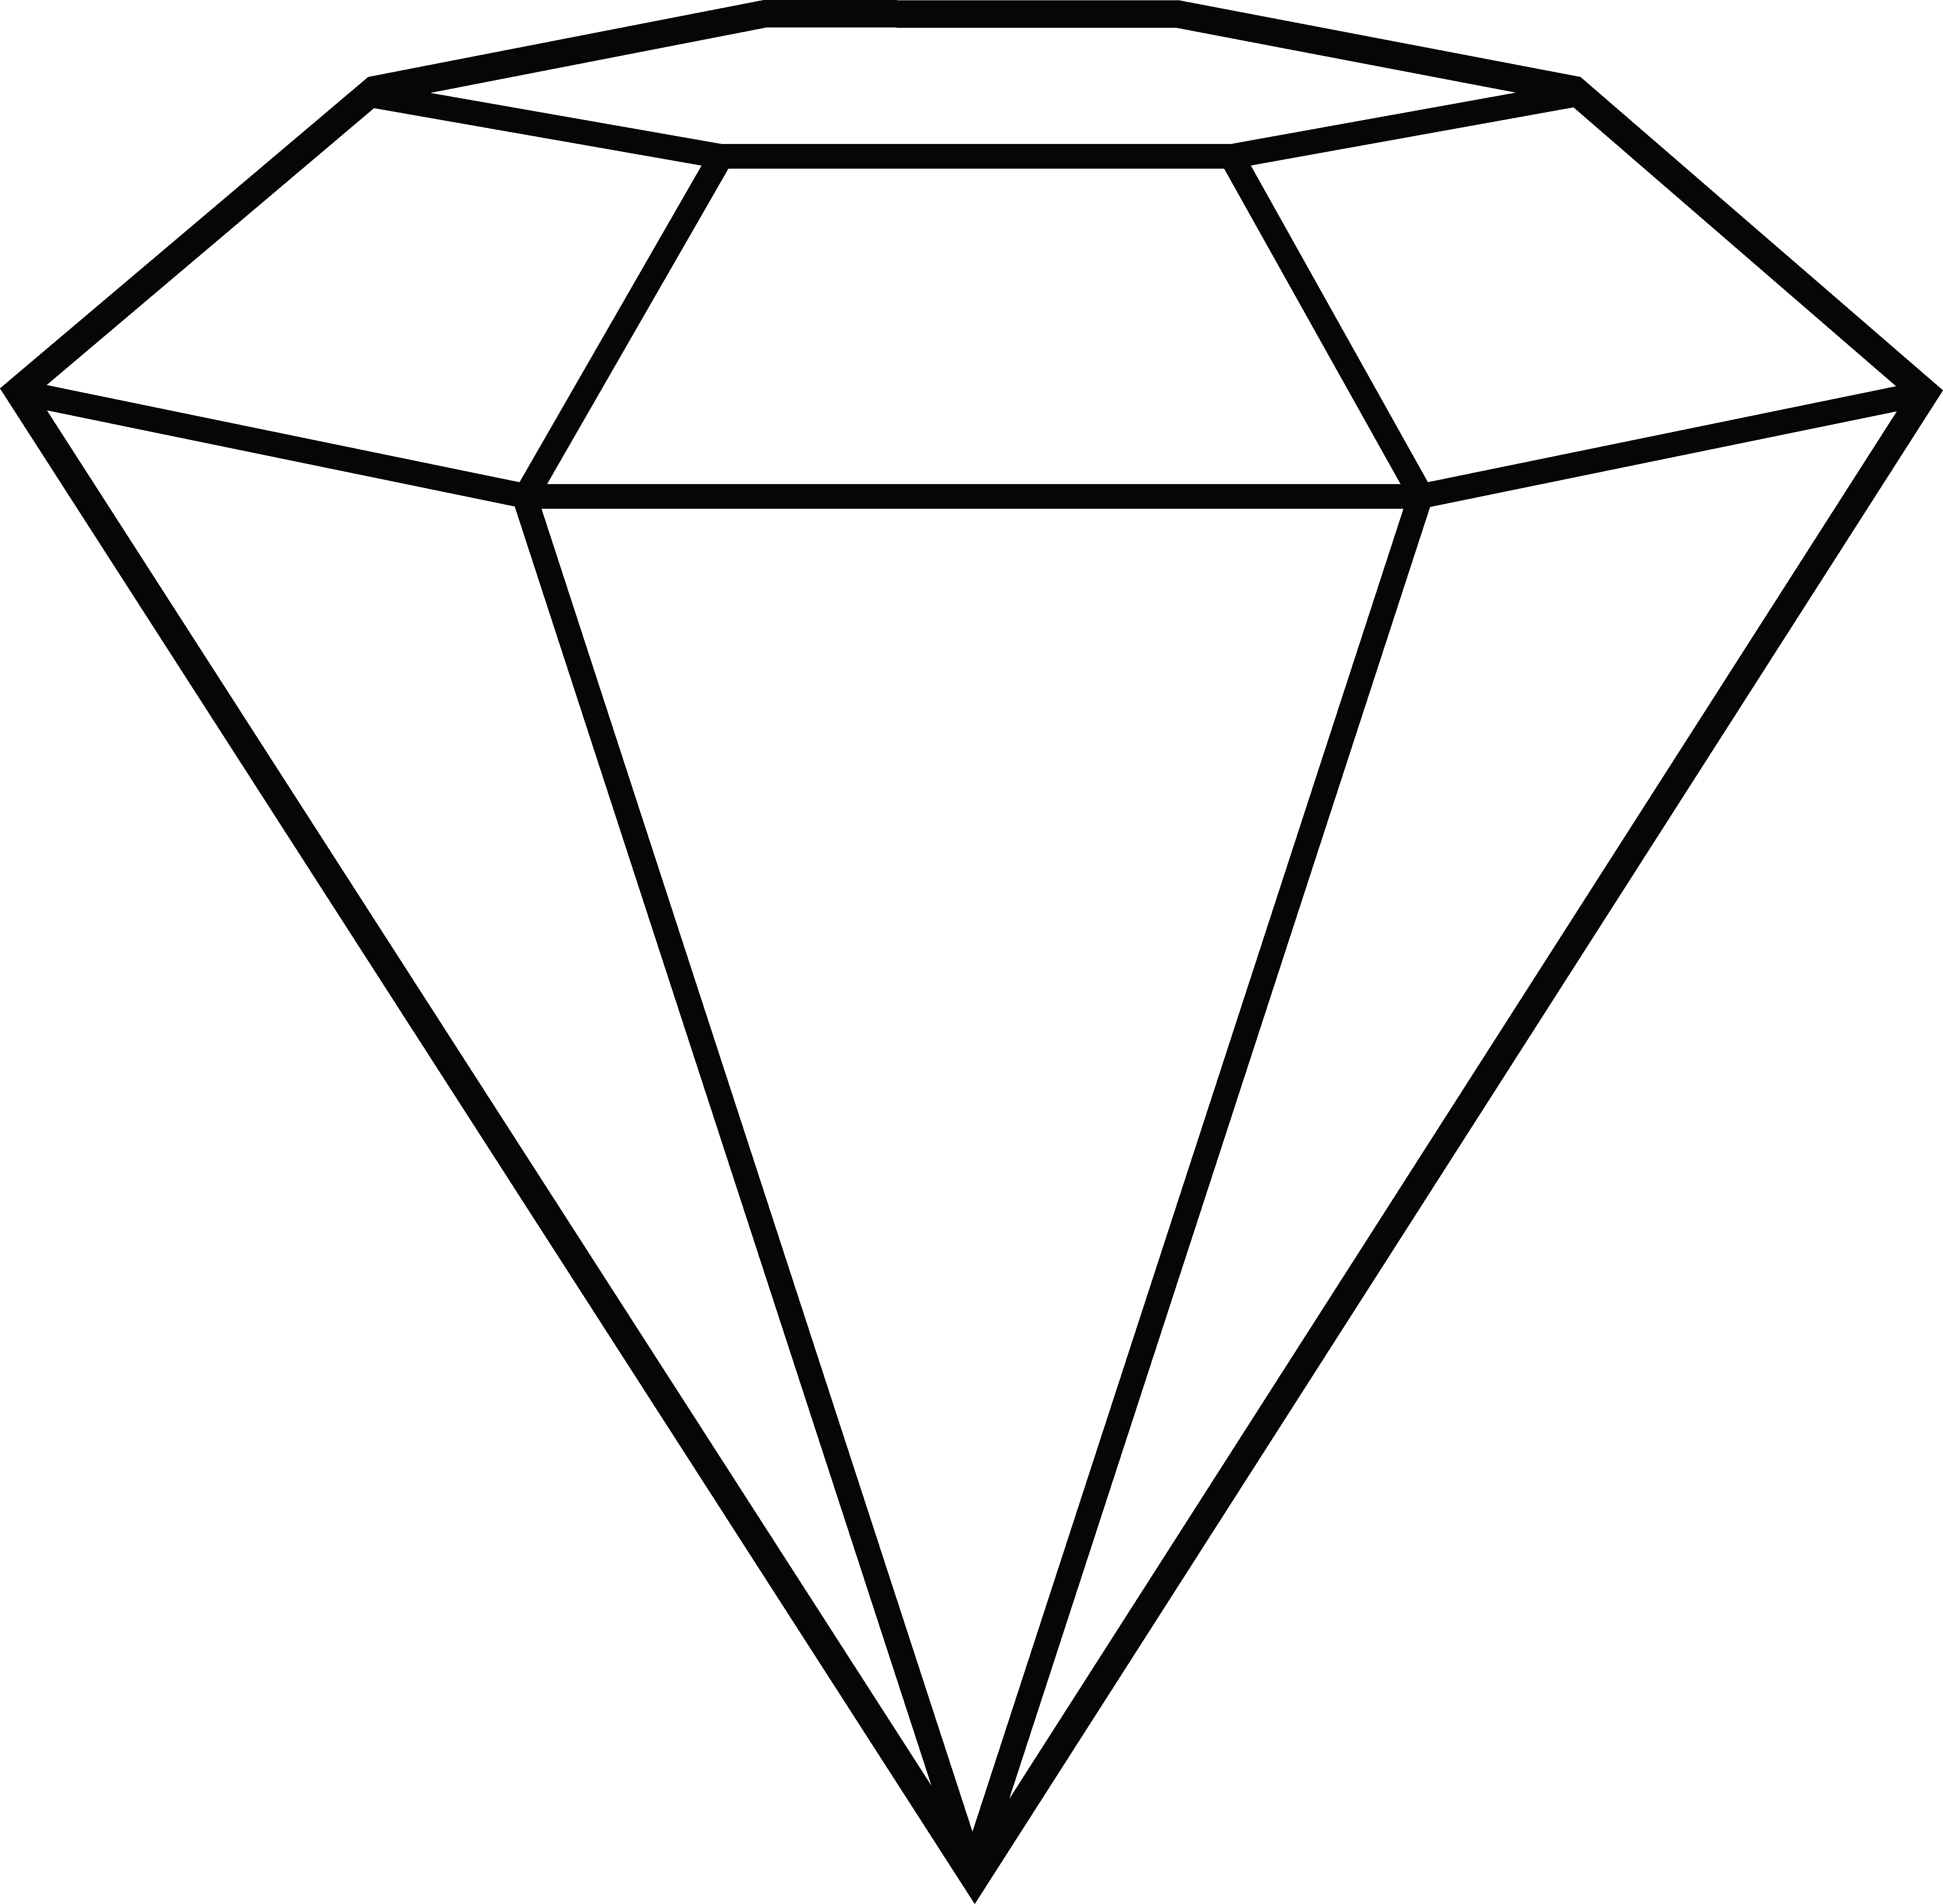 Super diamong outline clipart clip art free download Cartoon Diamond   Free Download Clip Art   Free Clip Art   on ... clip art free download